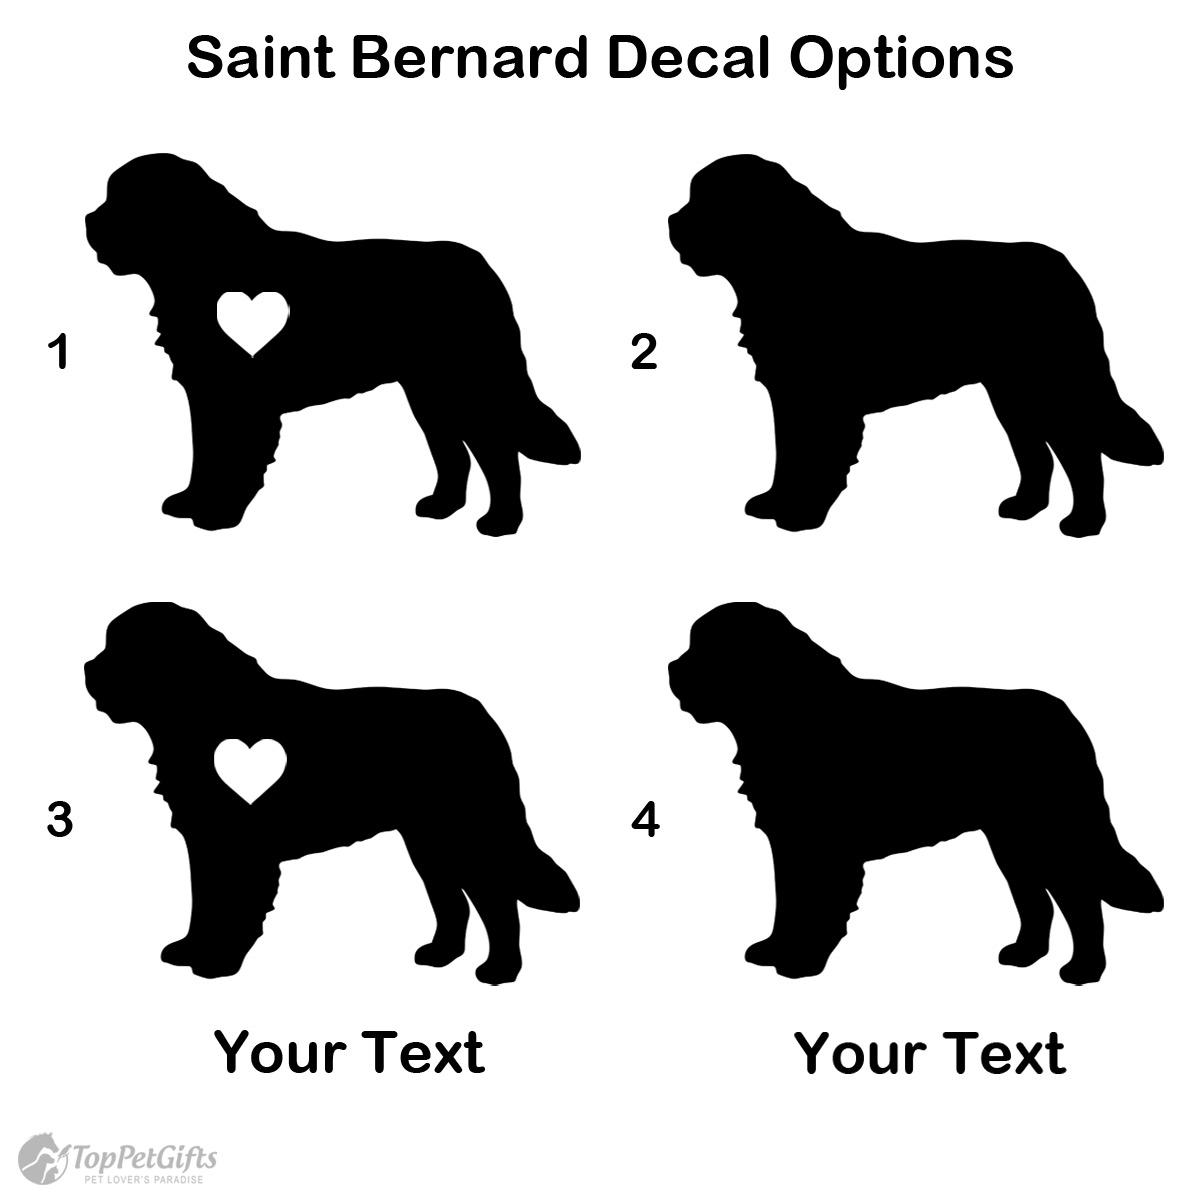 Personalized Saint Bernard Decal